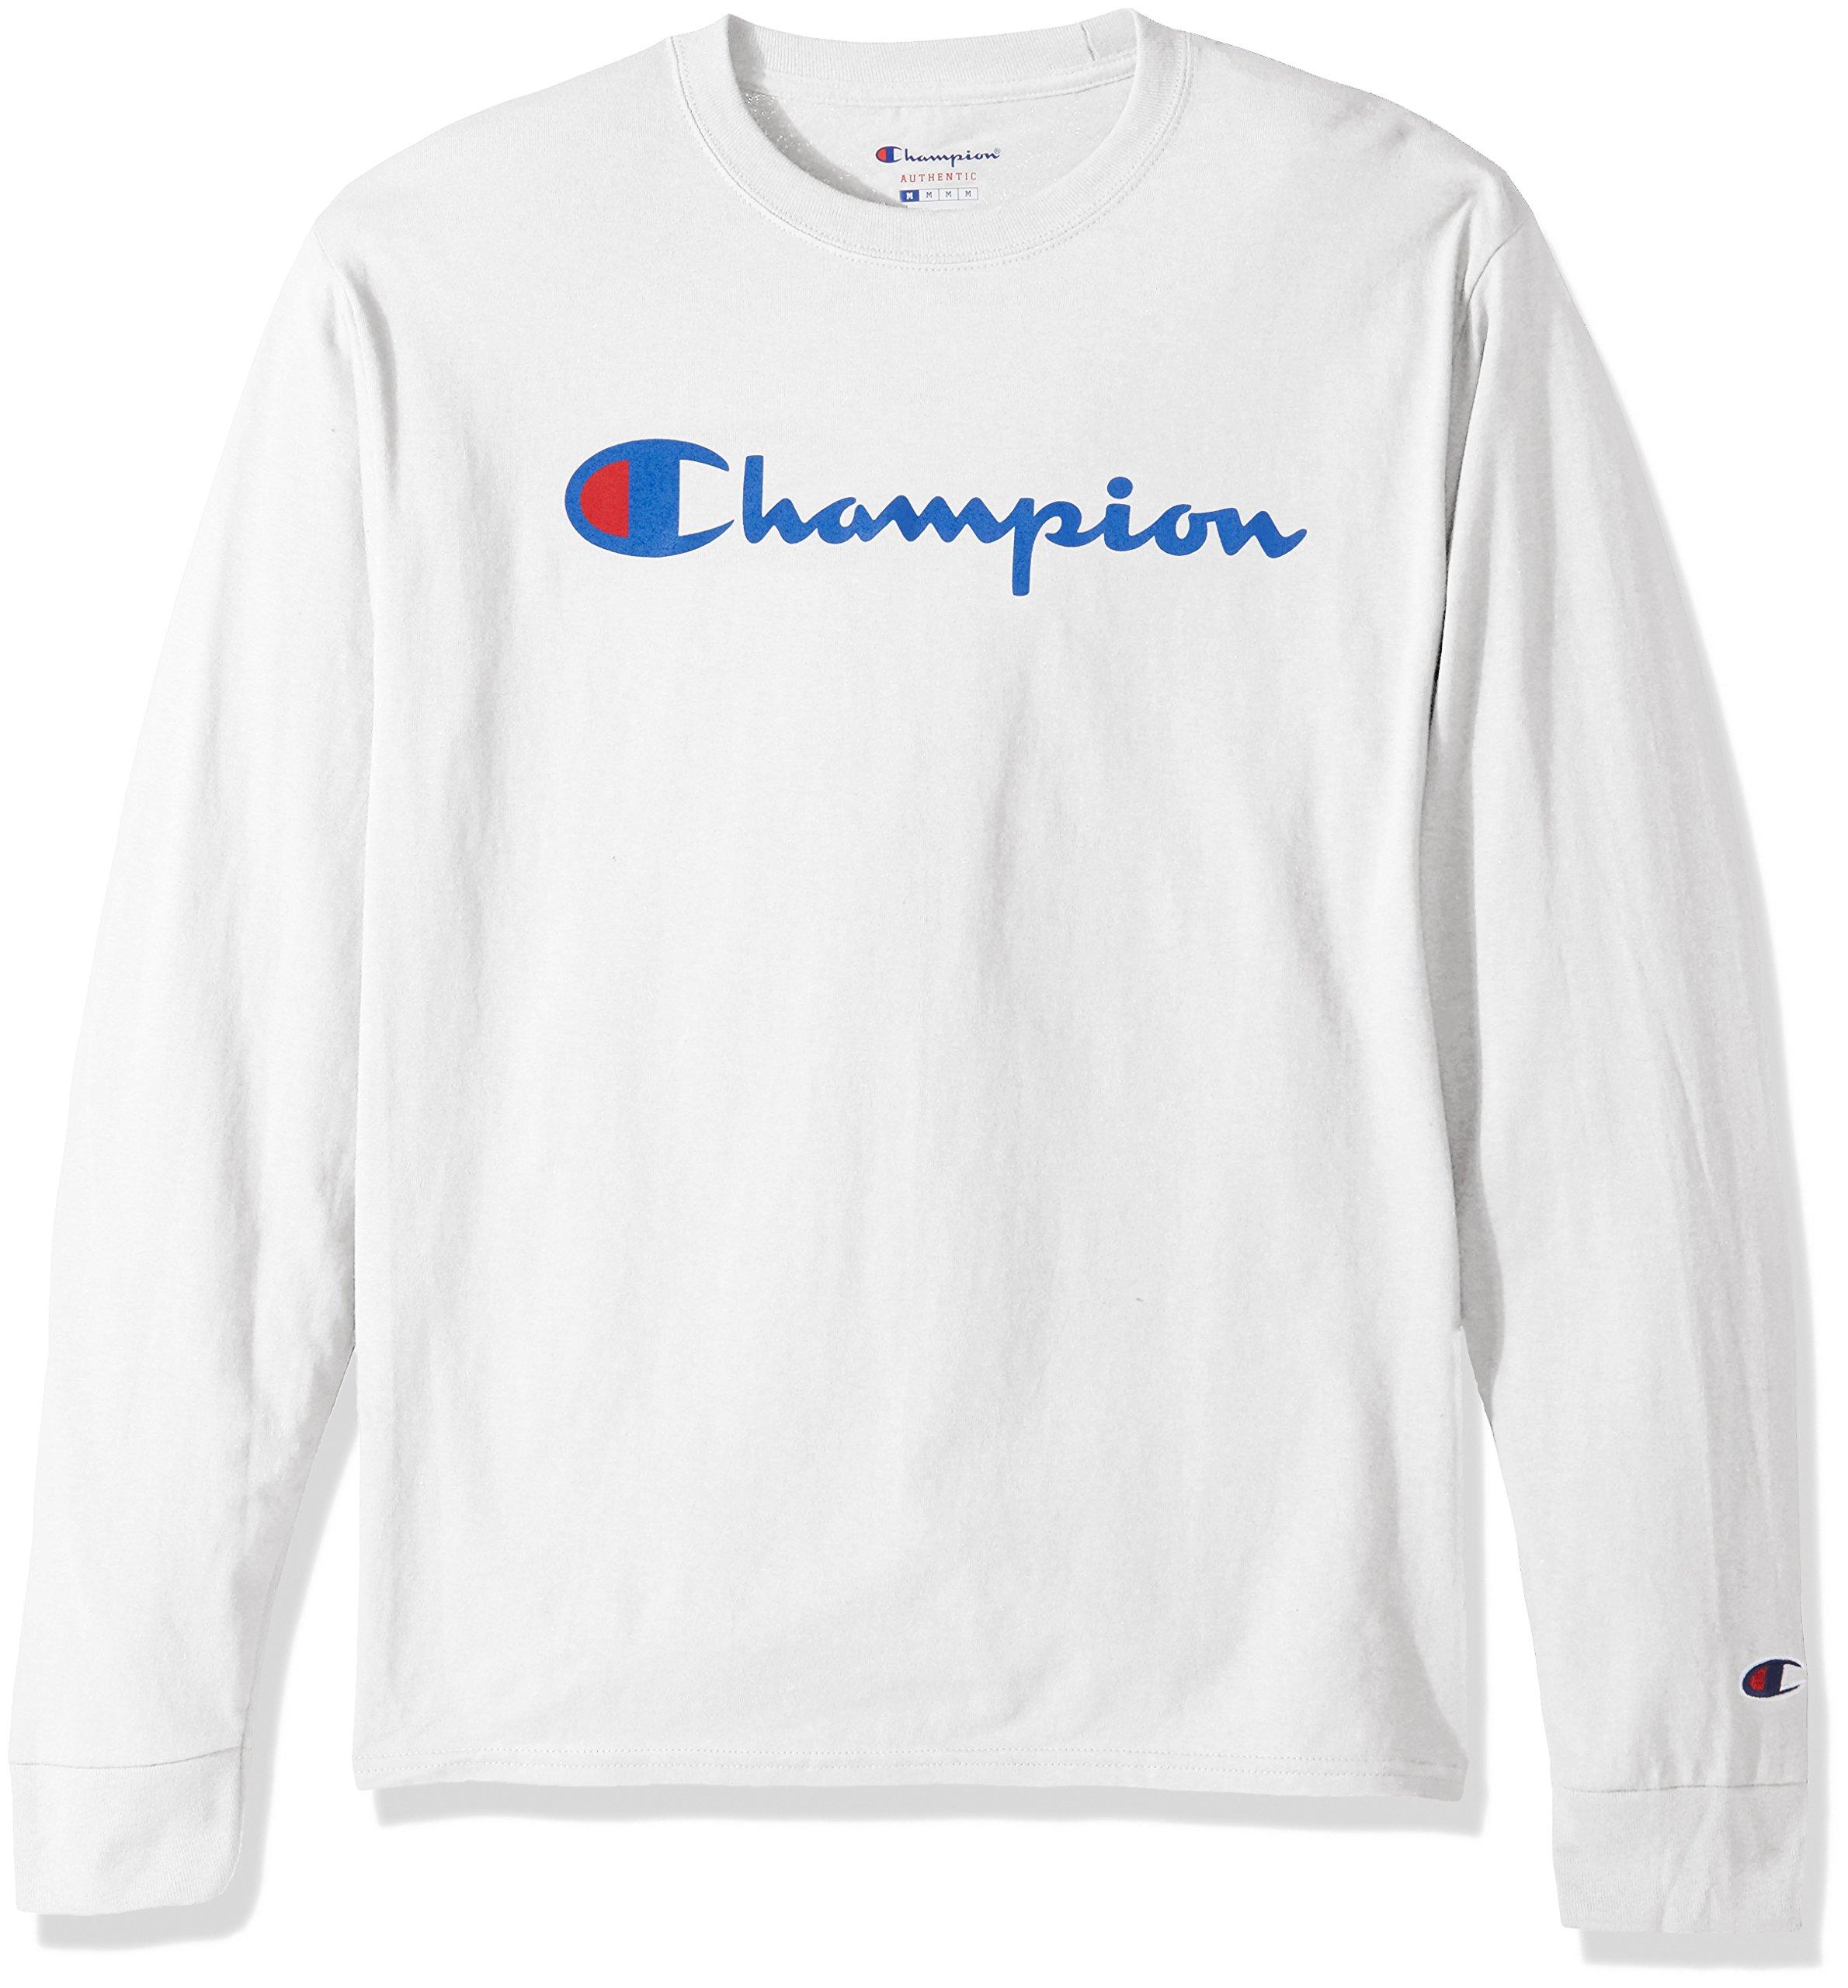 Champion LIFE Men's Cotton Long Sleeve Tee, White/Patriotic Script, Medium